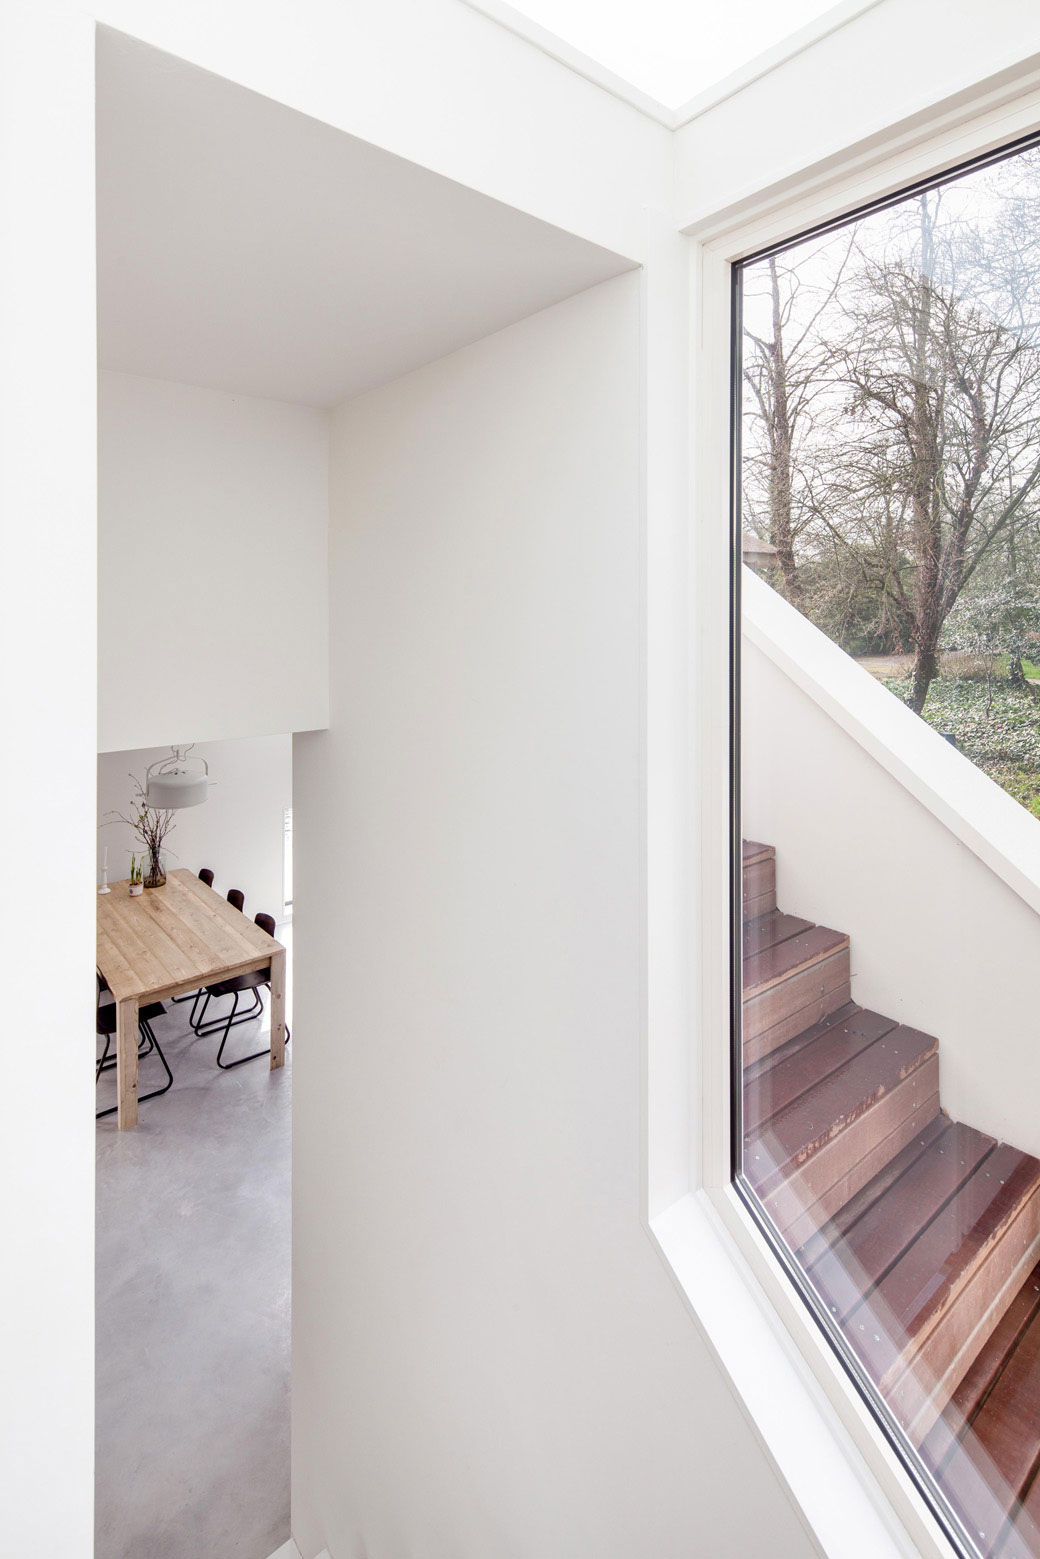 ParkrArk by BYTR architecten (13)